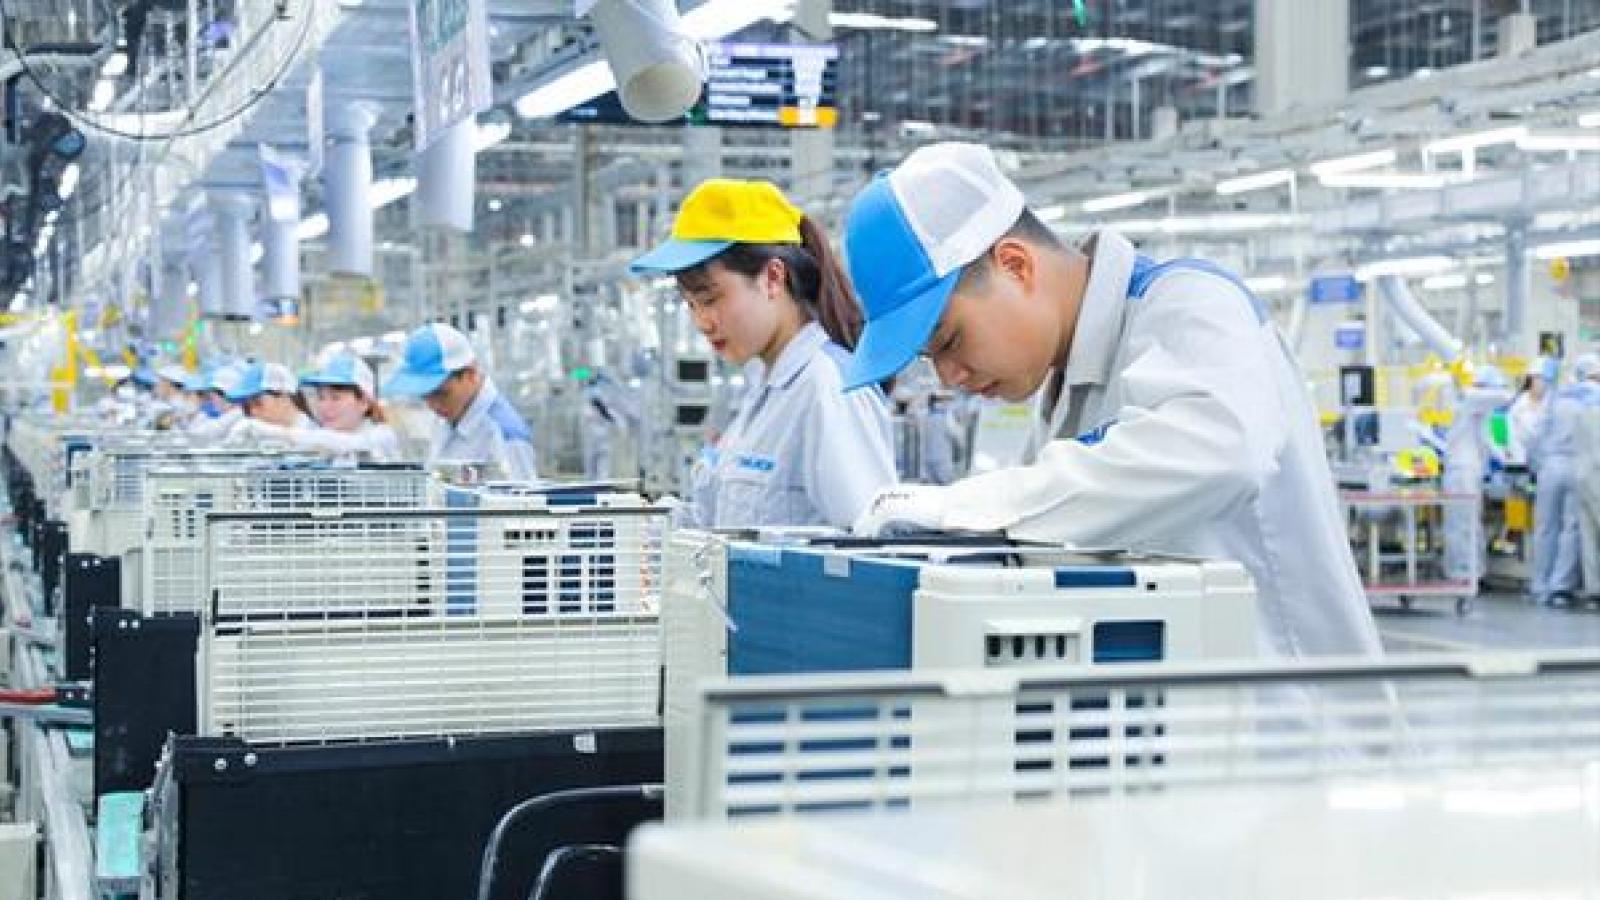 Vietnam becomes bright spot for foreign investors despite COVID-19